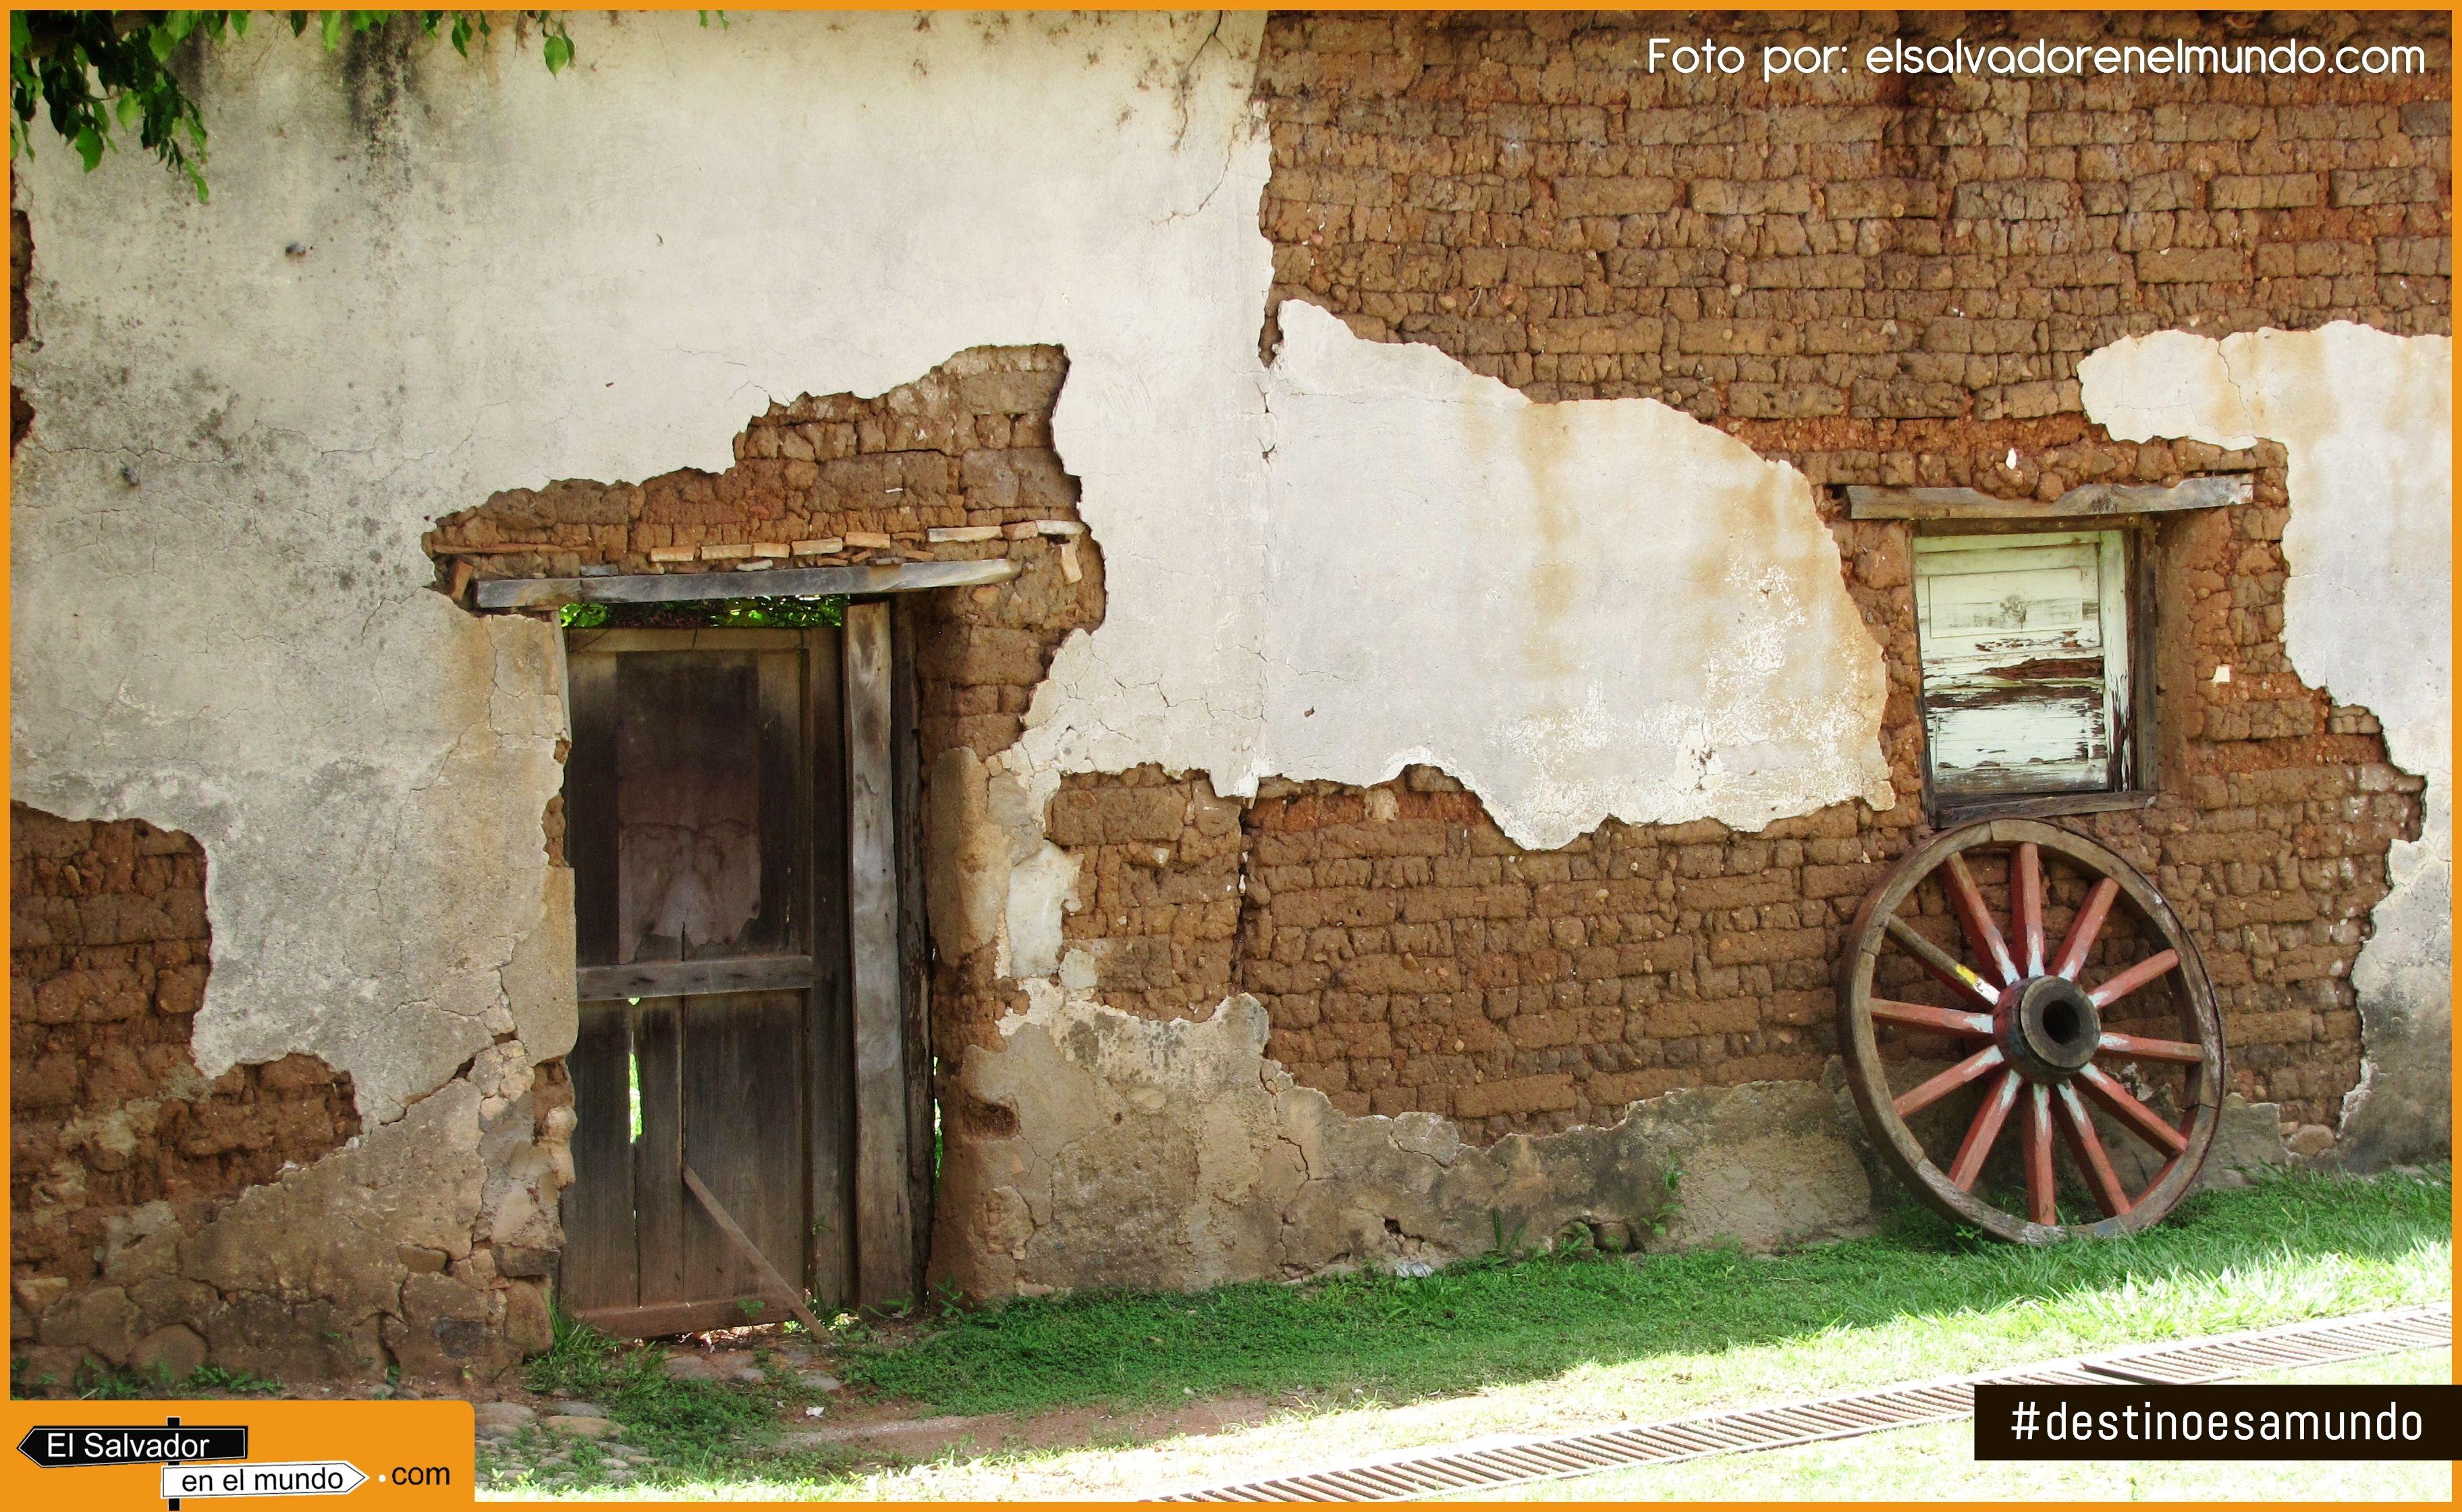 Antigua Fachada De Las Casas En Suchitoto Con Paredes De Adobe - Fachadas-antiguas-de-casas